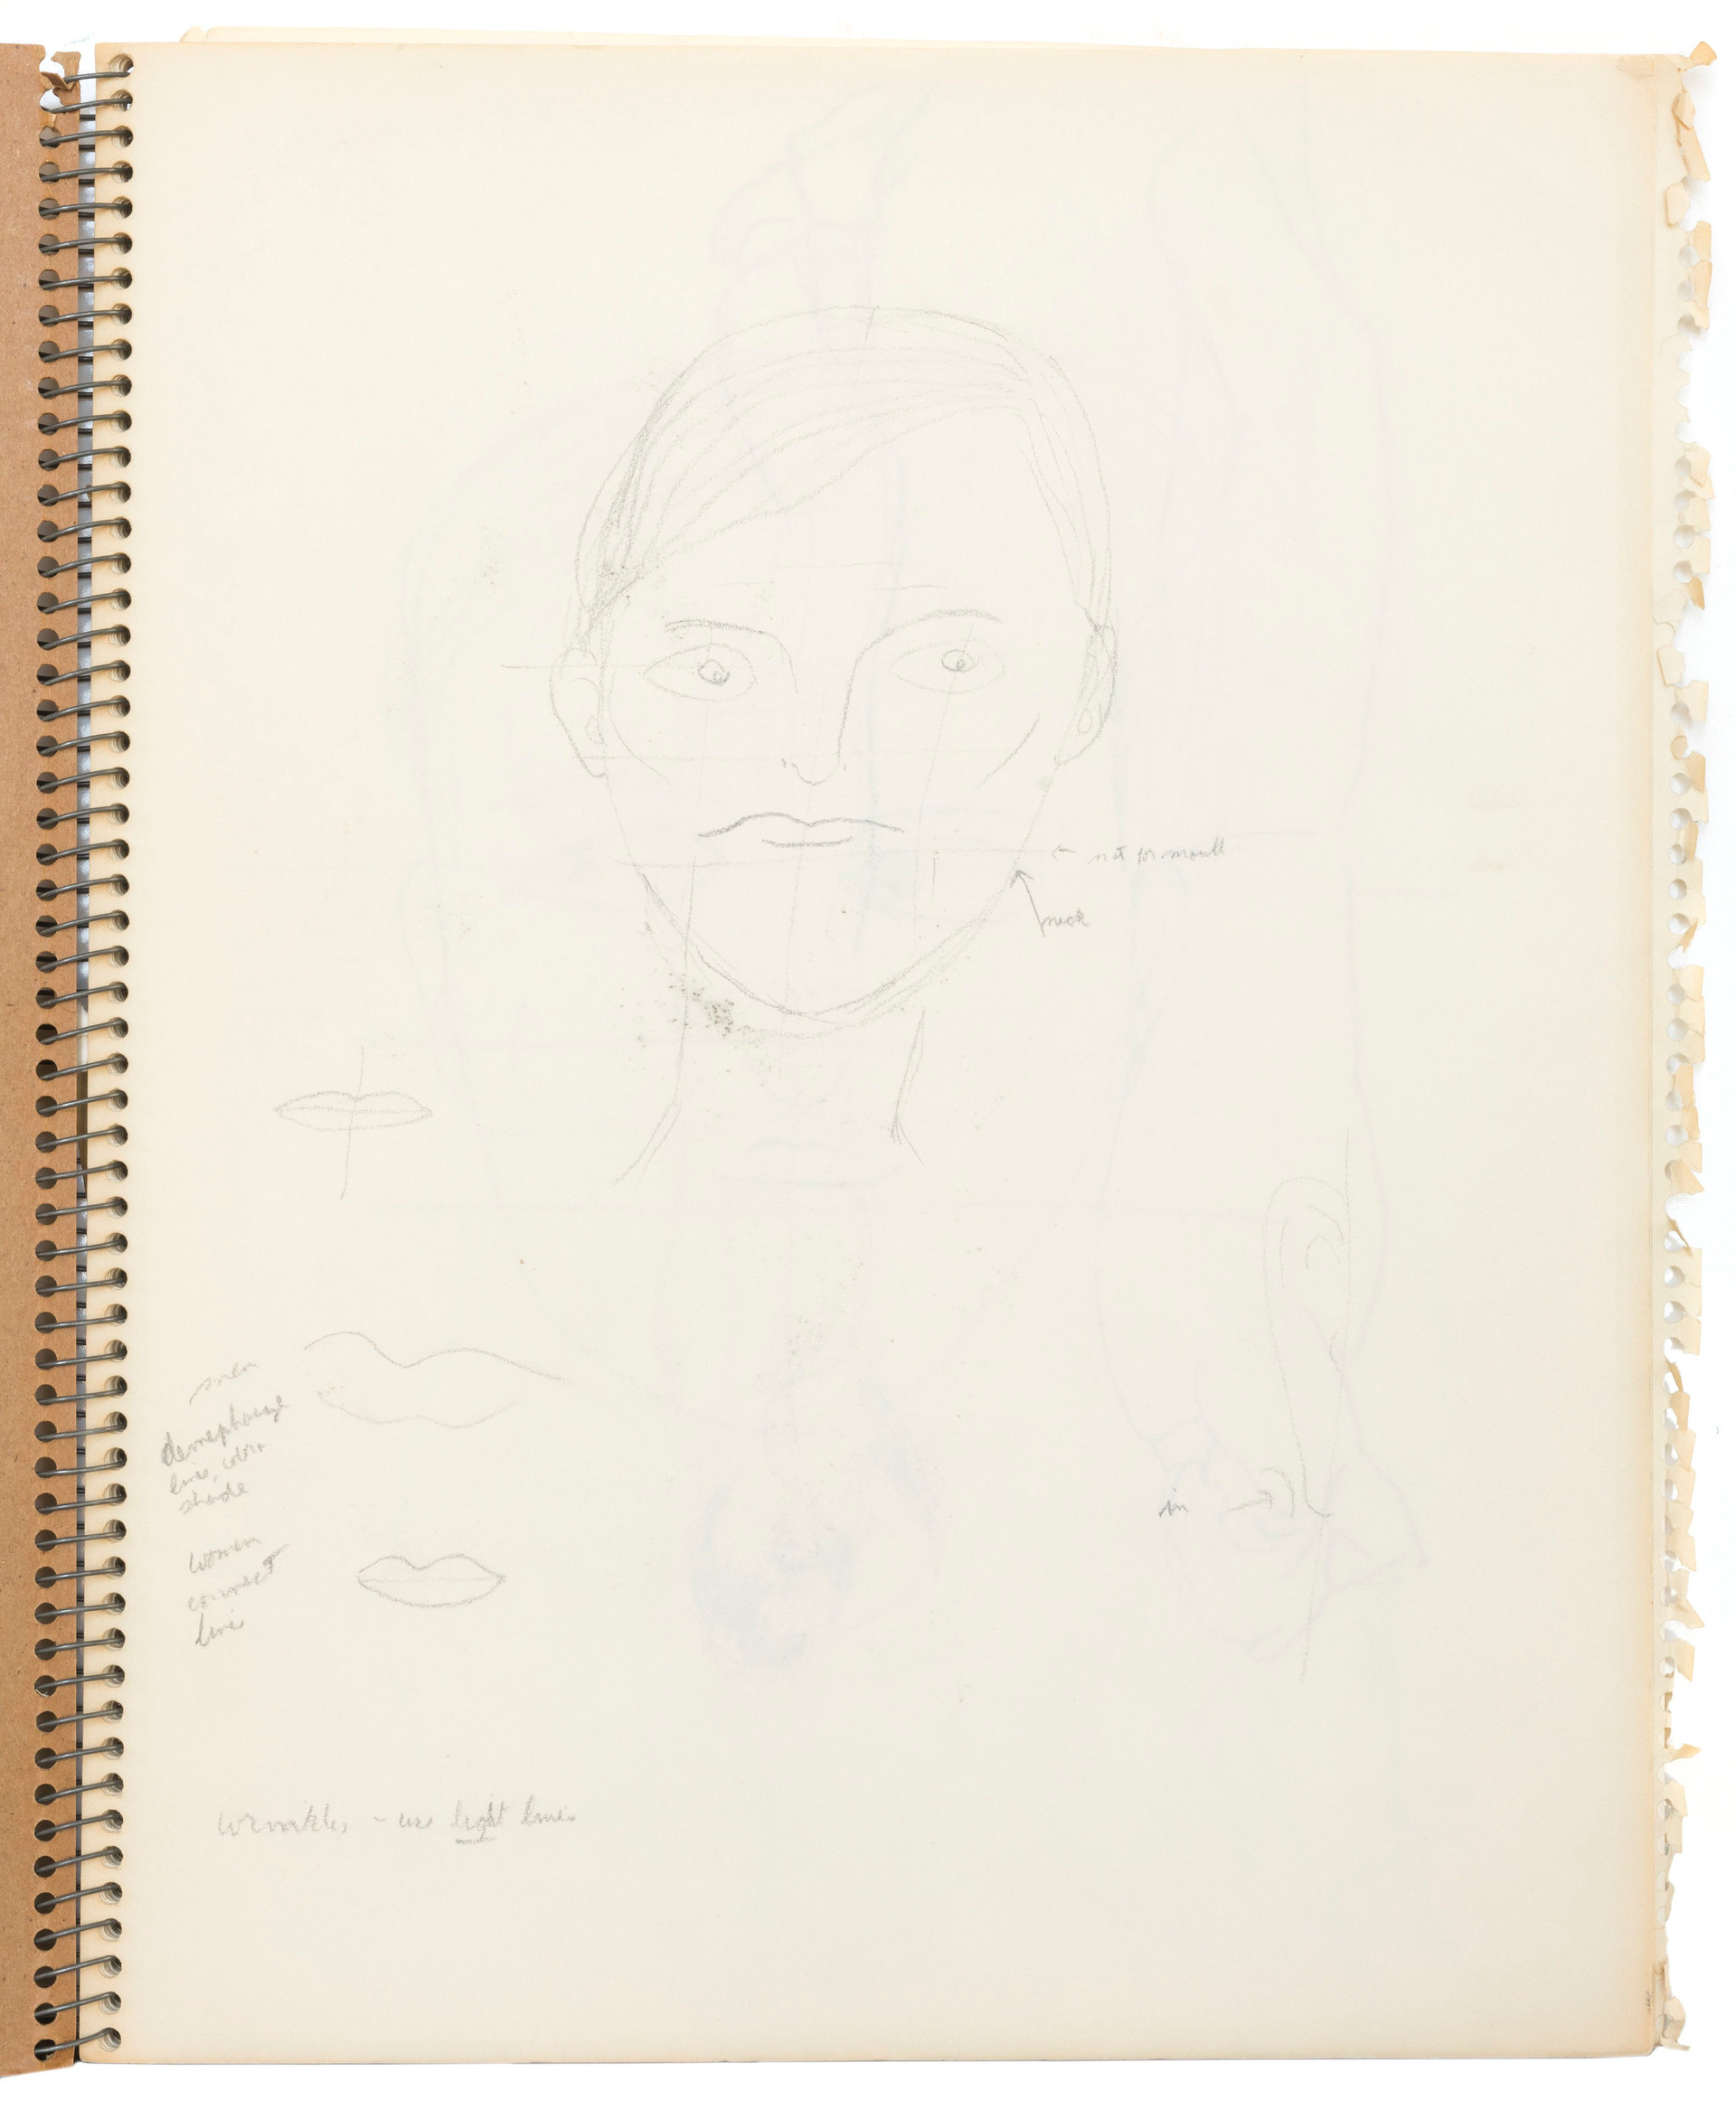 Sketch book 2 (inside)